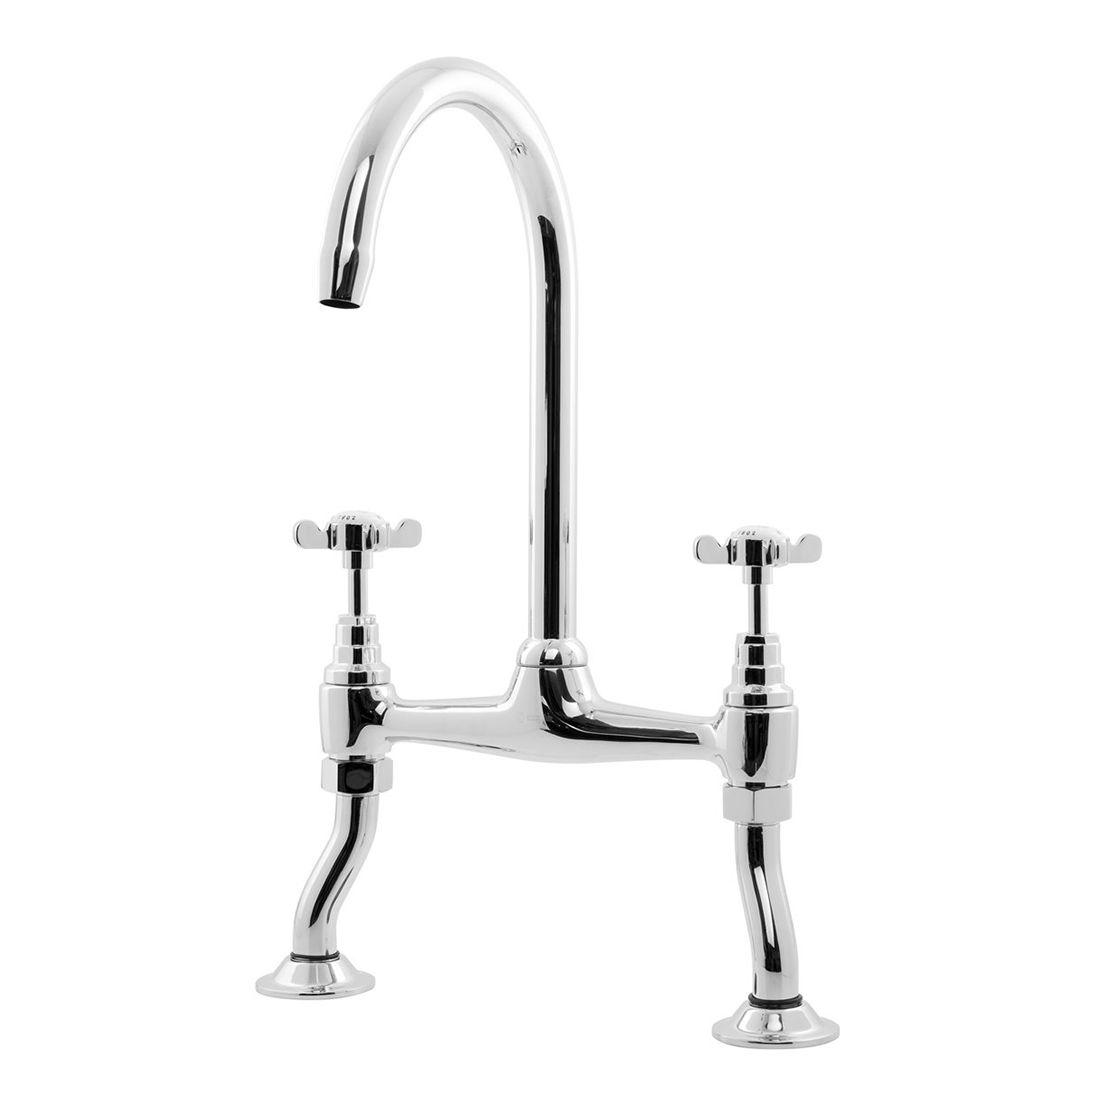 caple buckingham deck mounted kitchen tap sinks taps com deck-mounted sink mixer kitchen tap chrome Kitchen Faucets